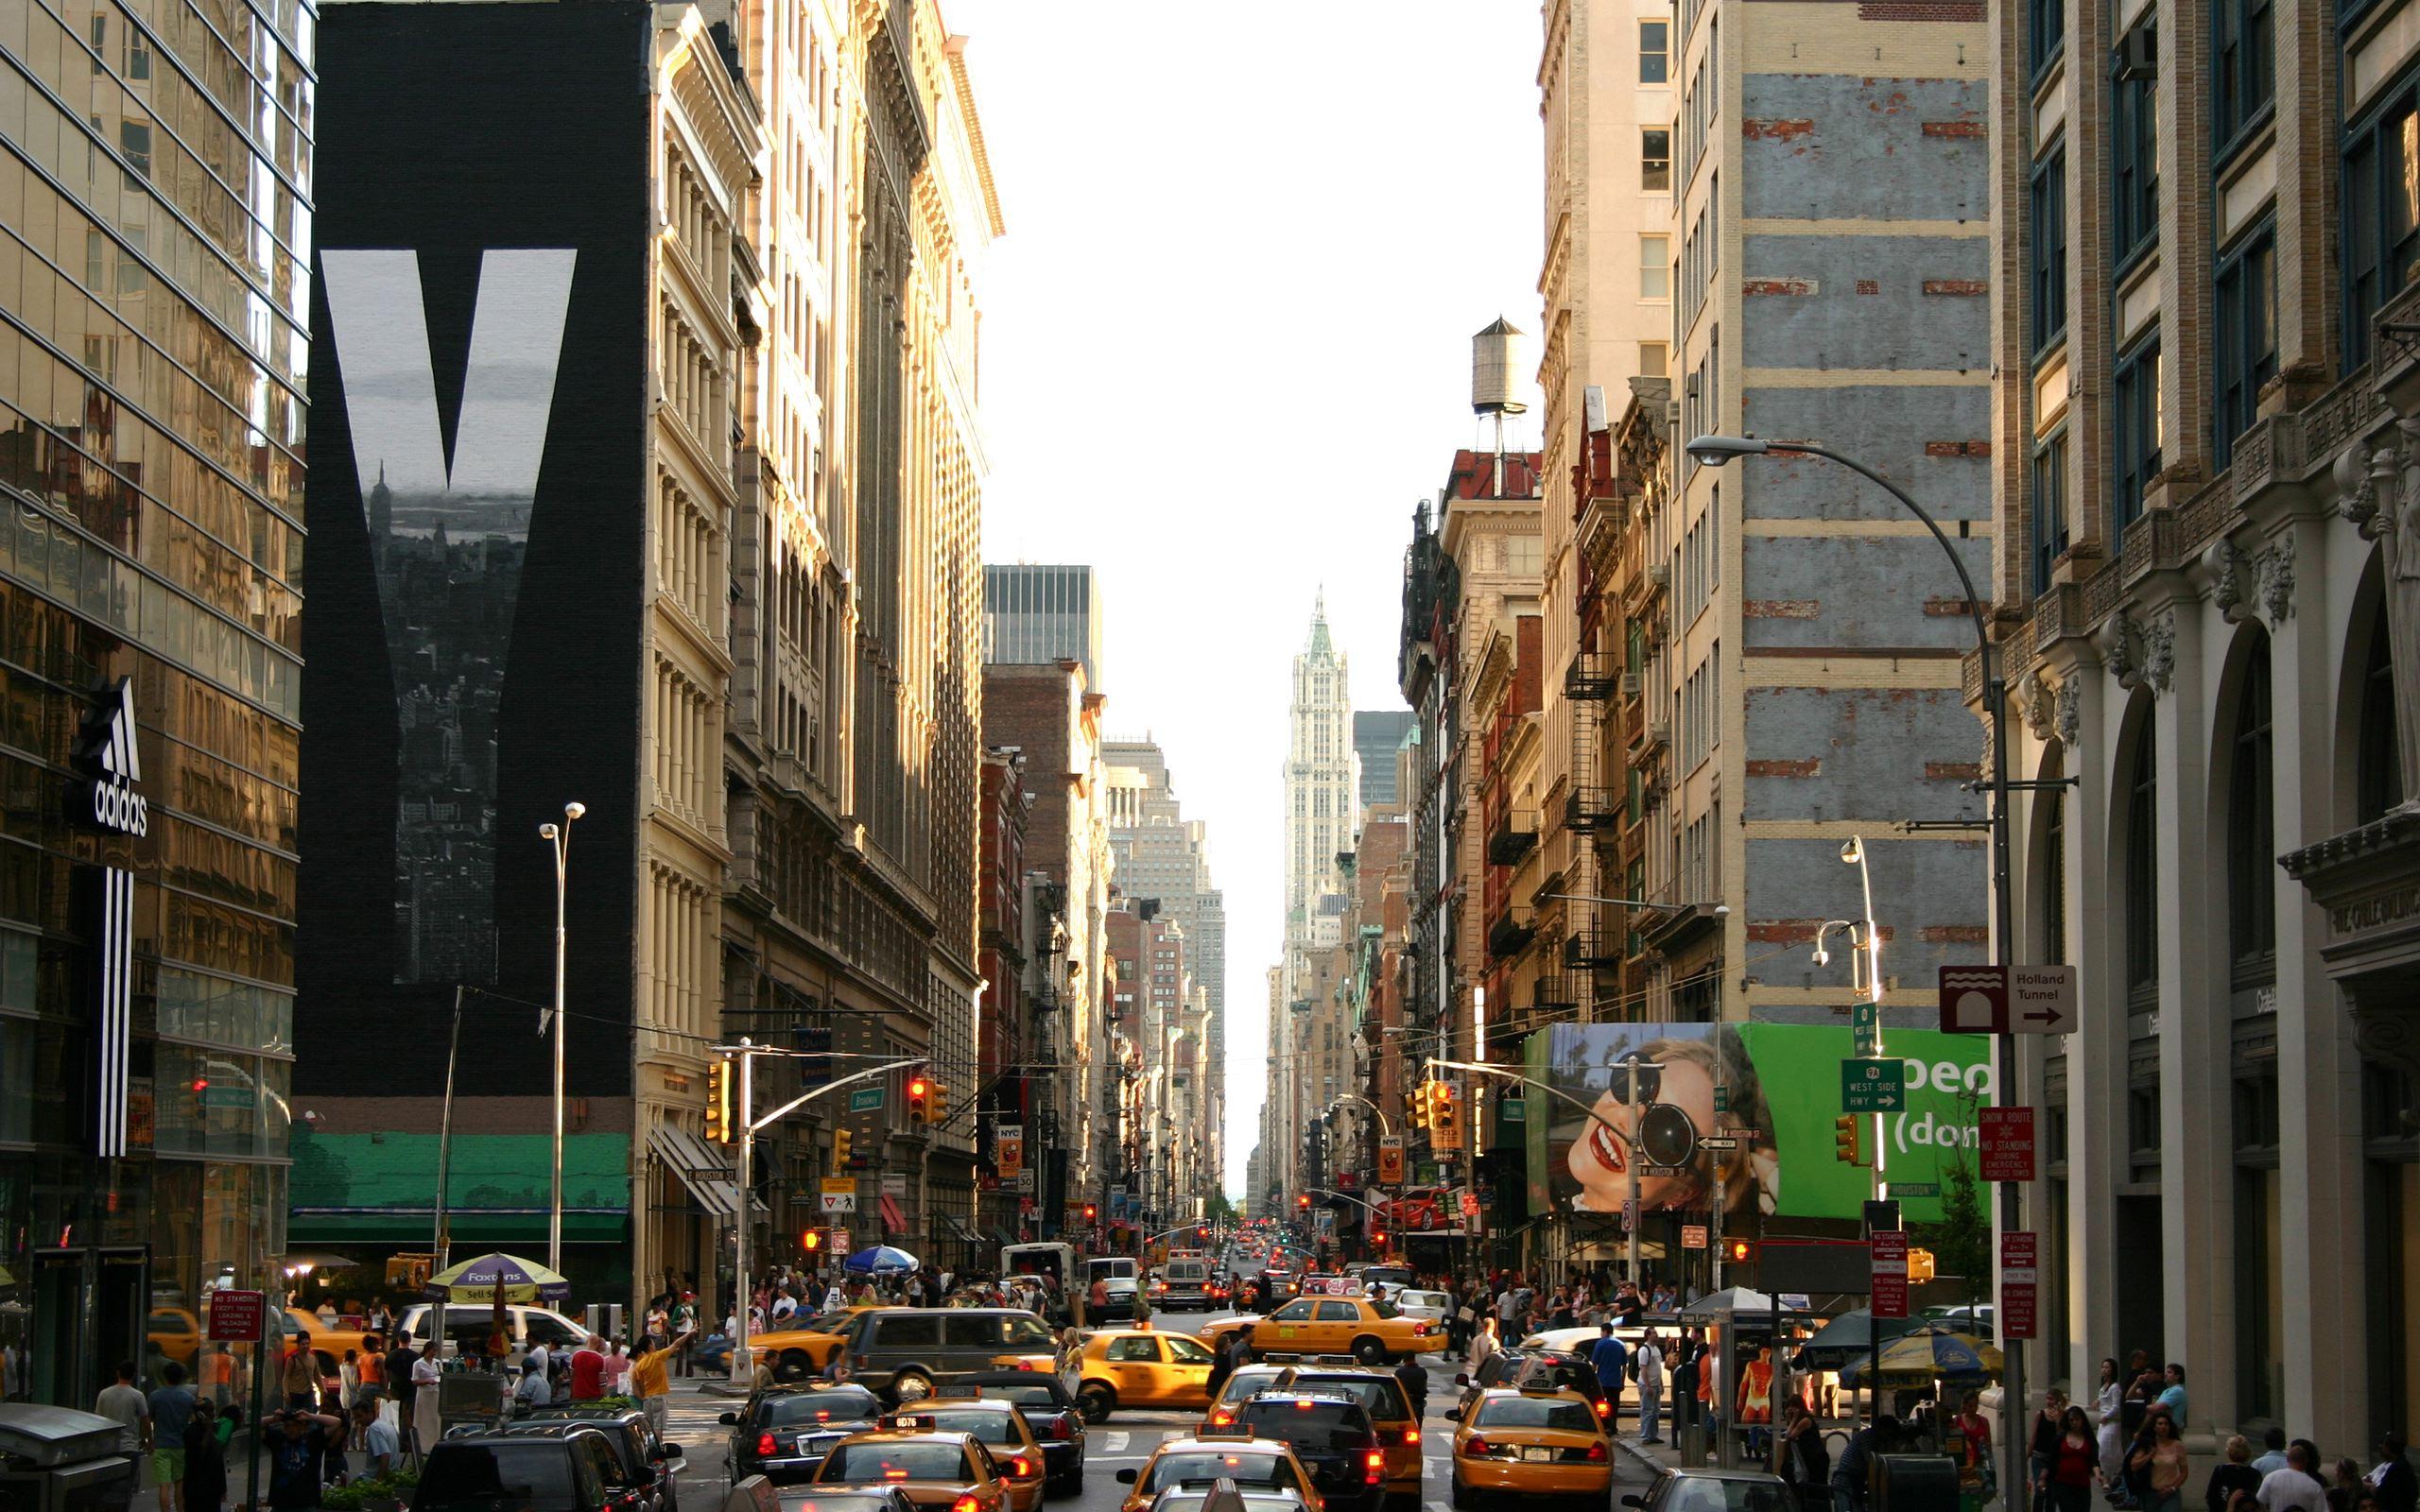 New York City Pics & images